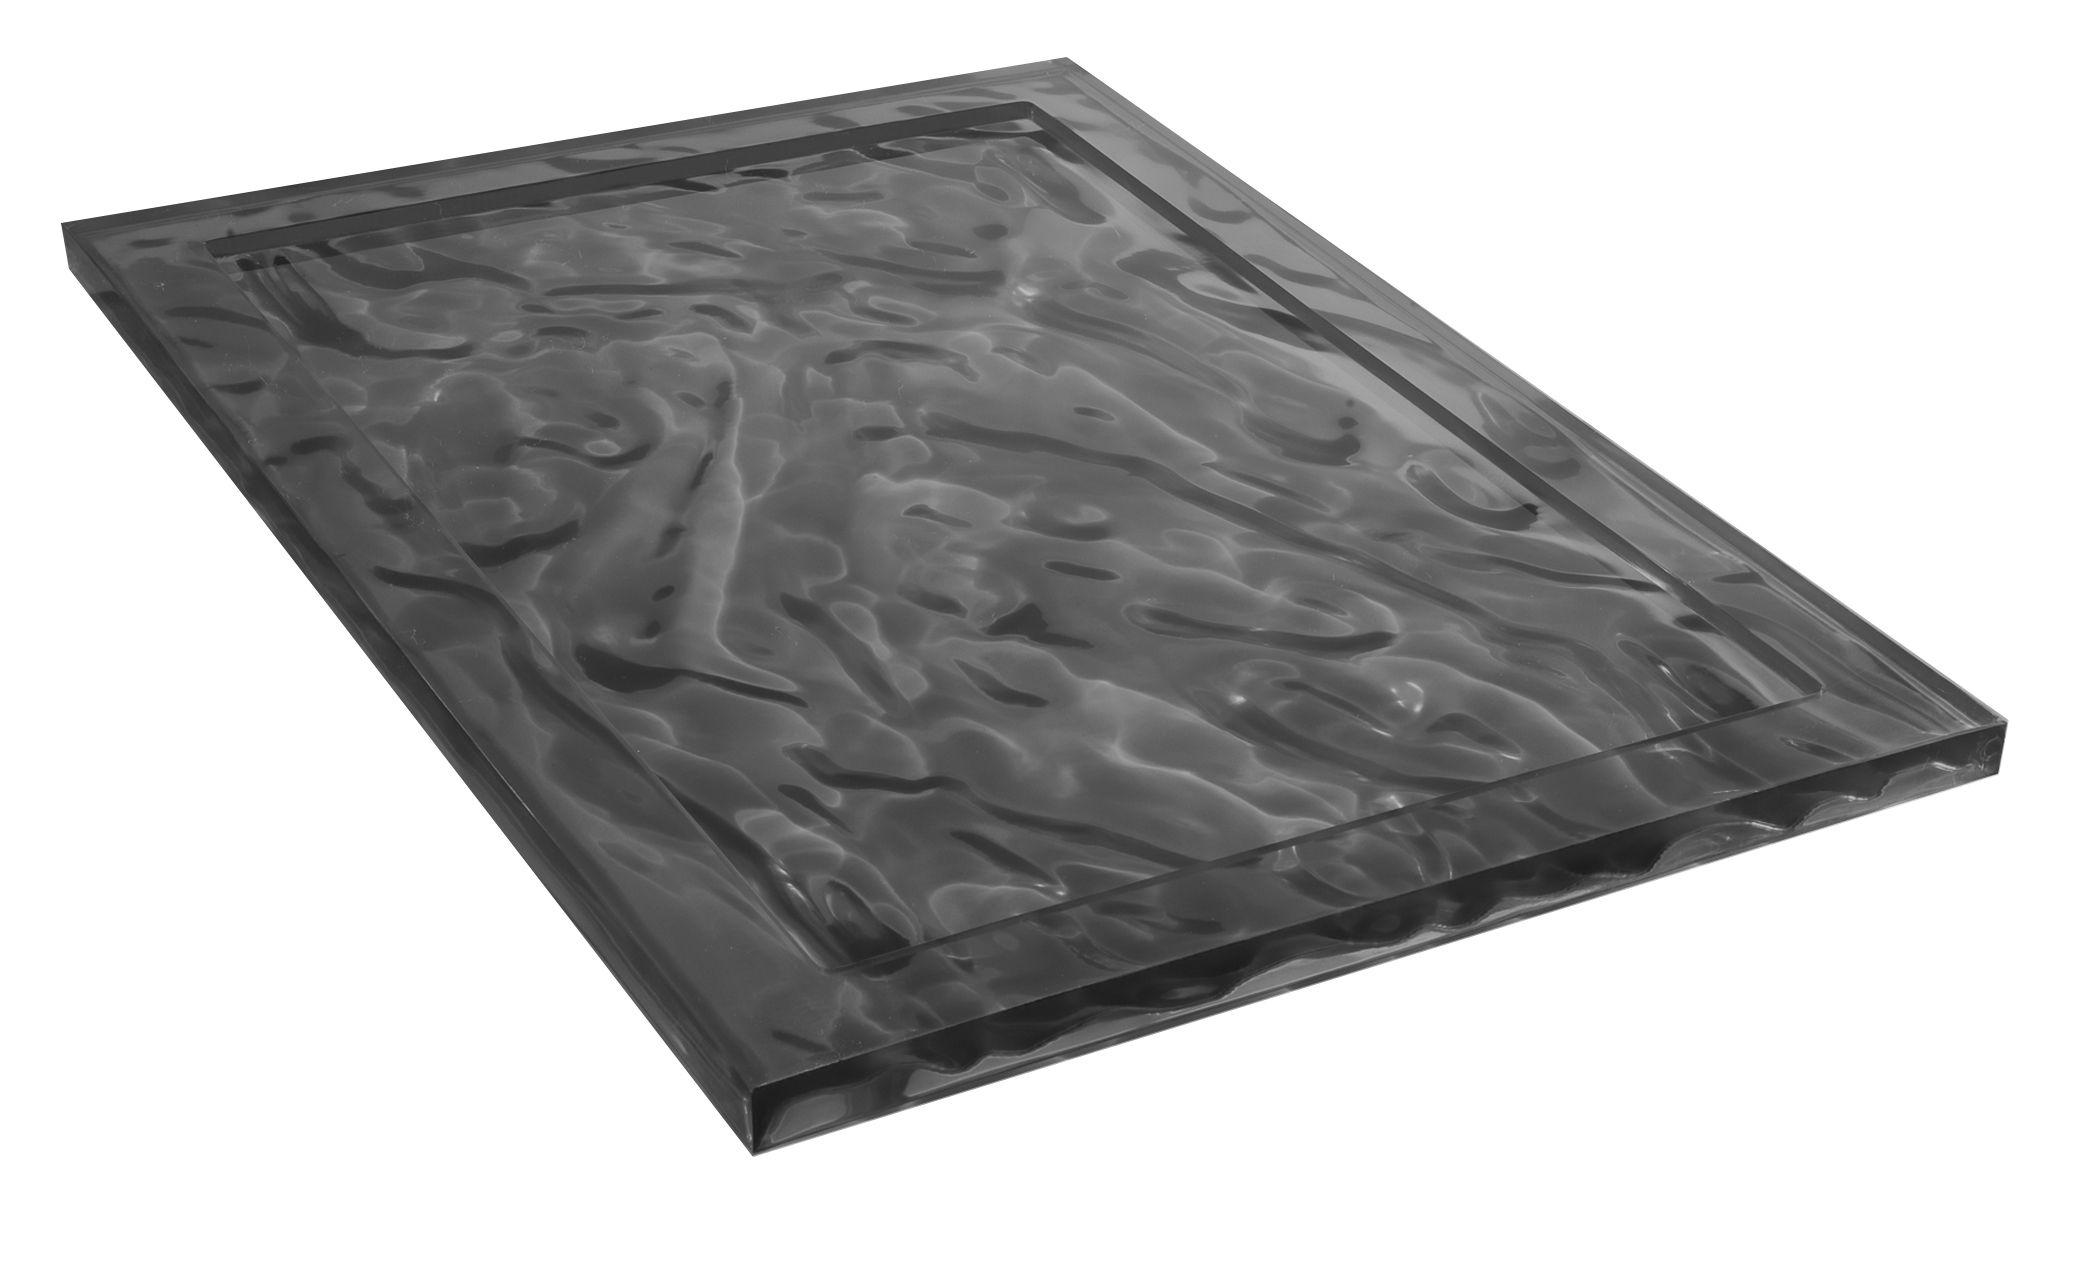 Tavola - Vassoi  - Piano/vassoio Dune Large - 55 x 38 cm di Kartell - Fumé - Tecnopolimero